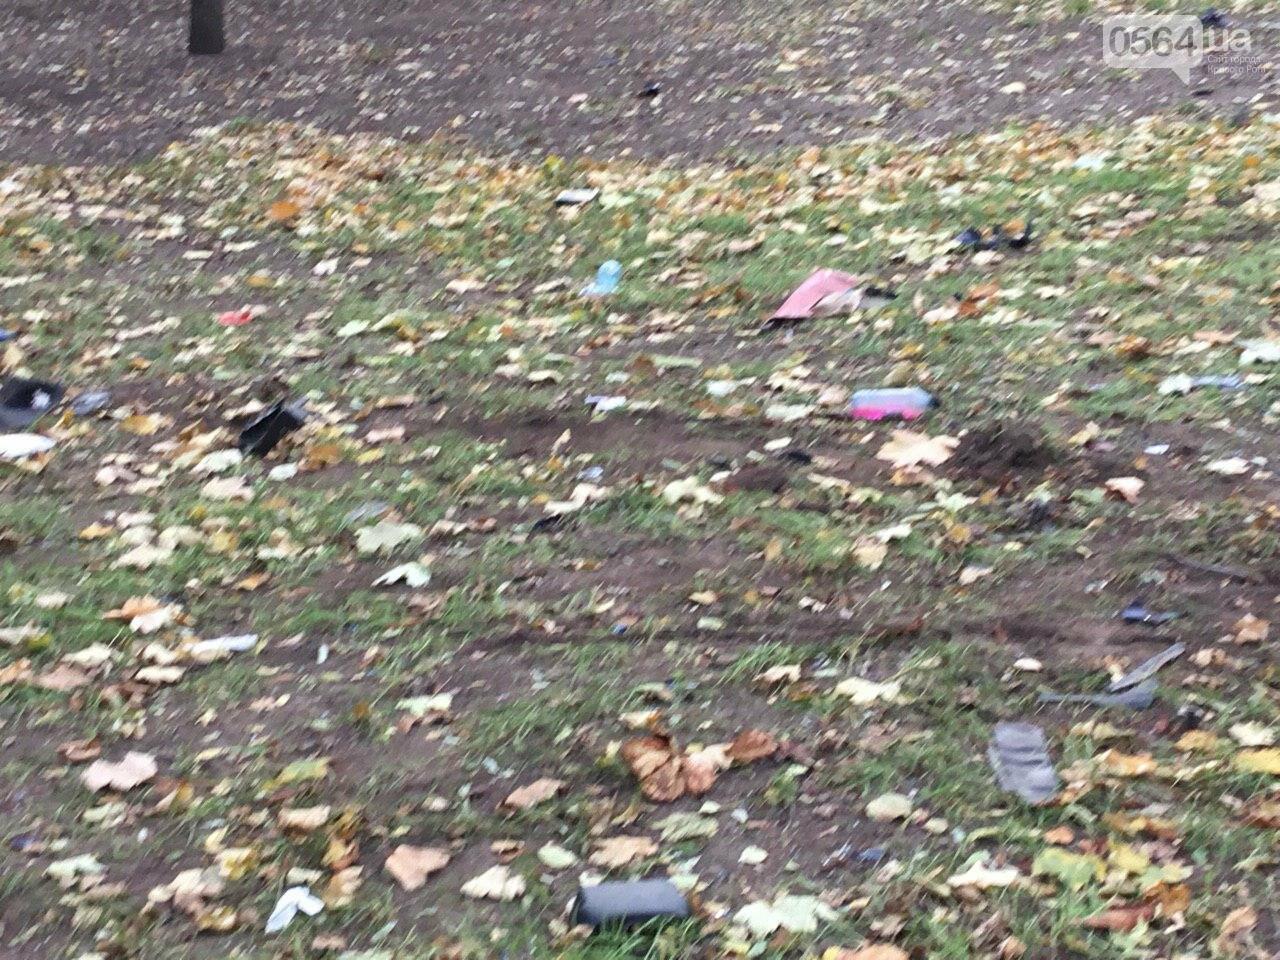 Куски стекла и обшивки разбившейся в Кривом Роге иномарки разлетелись на десятки метров, - ФОТО, фото-5